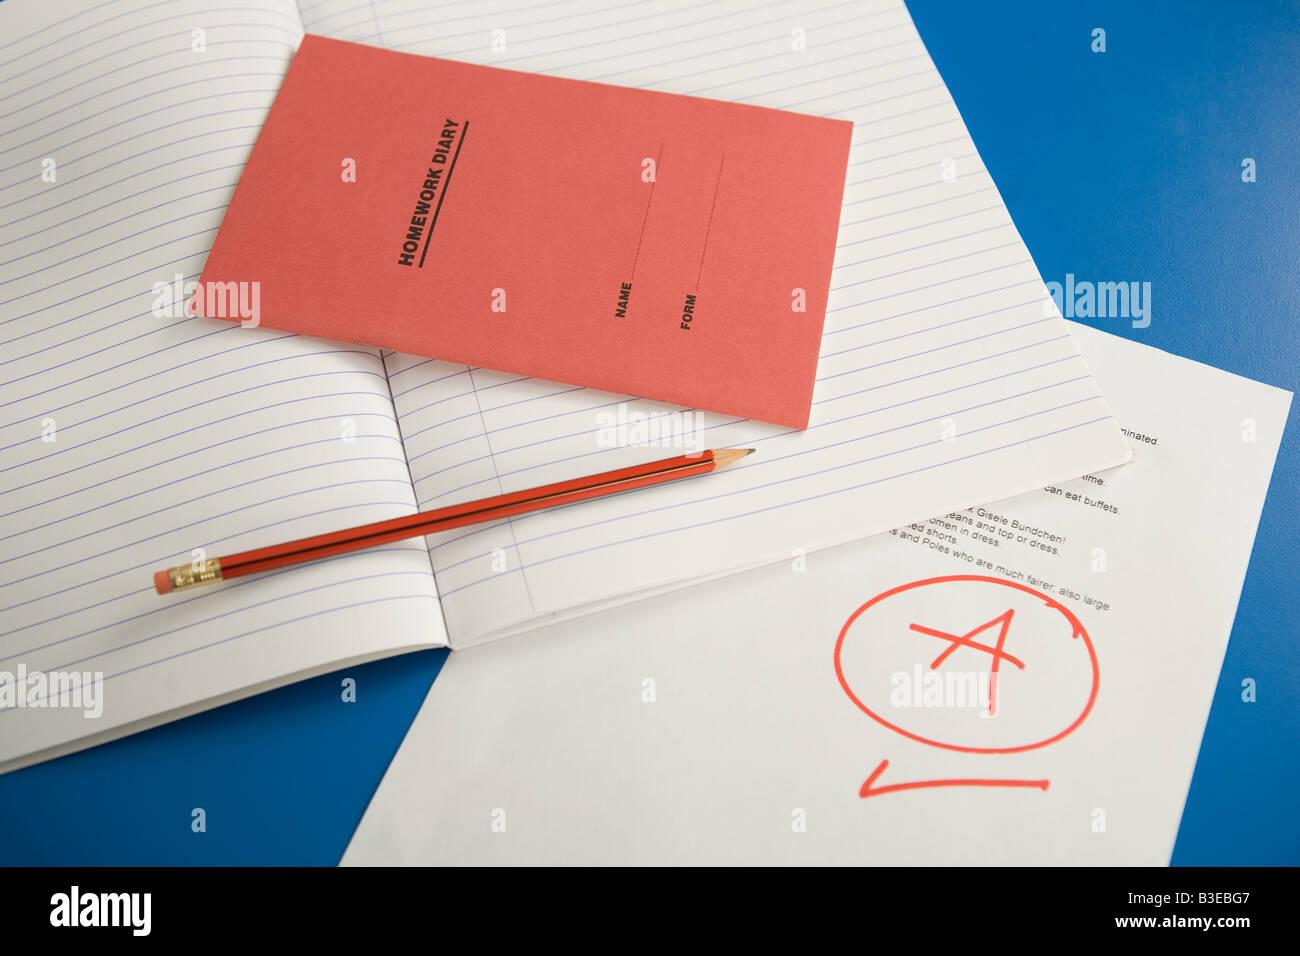 Homework Diary School Education Stock Photos & Homework